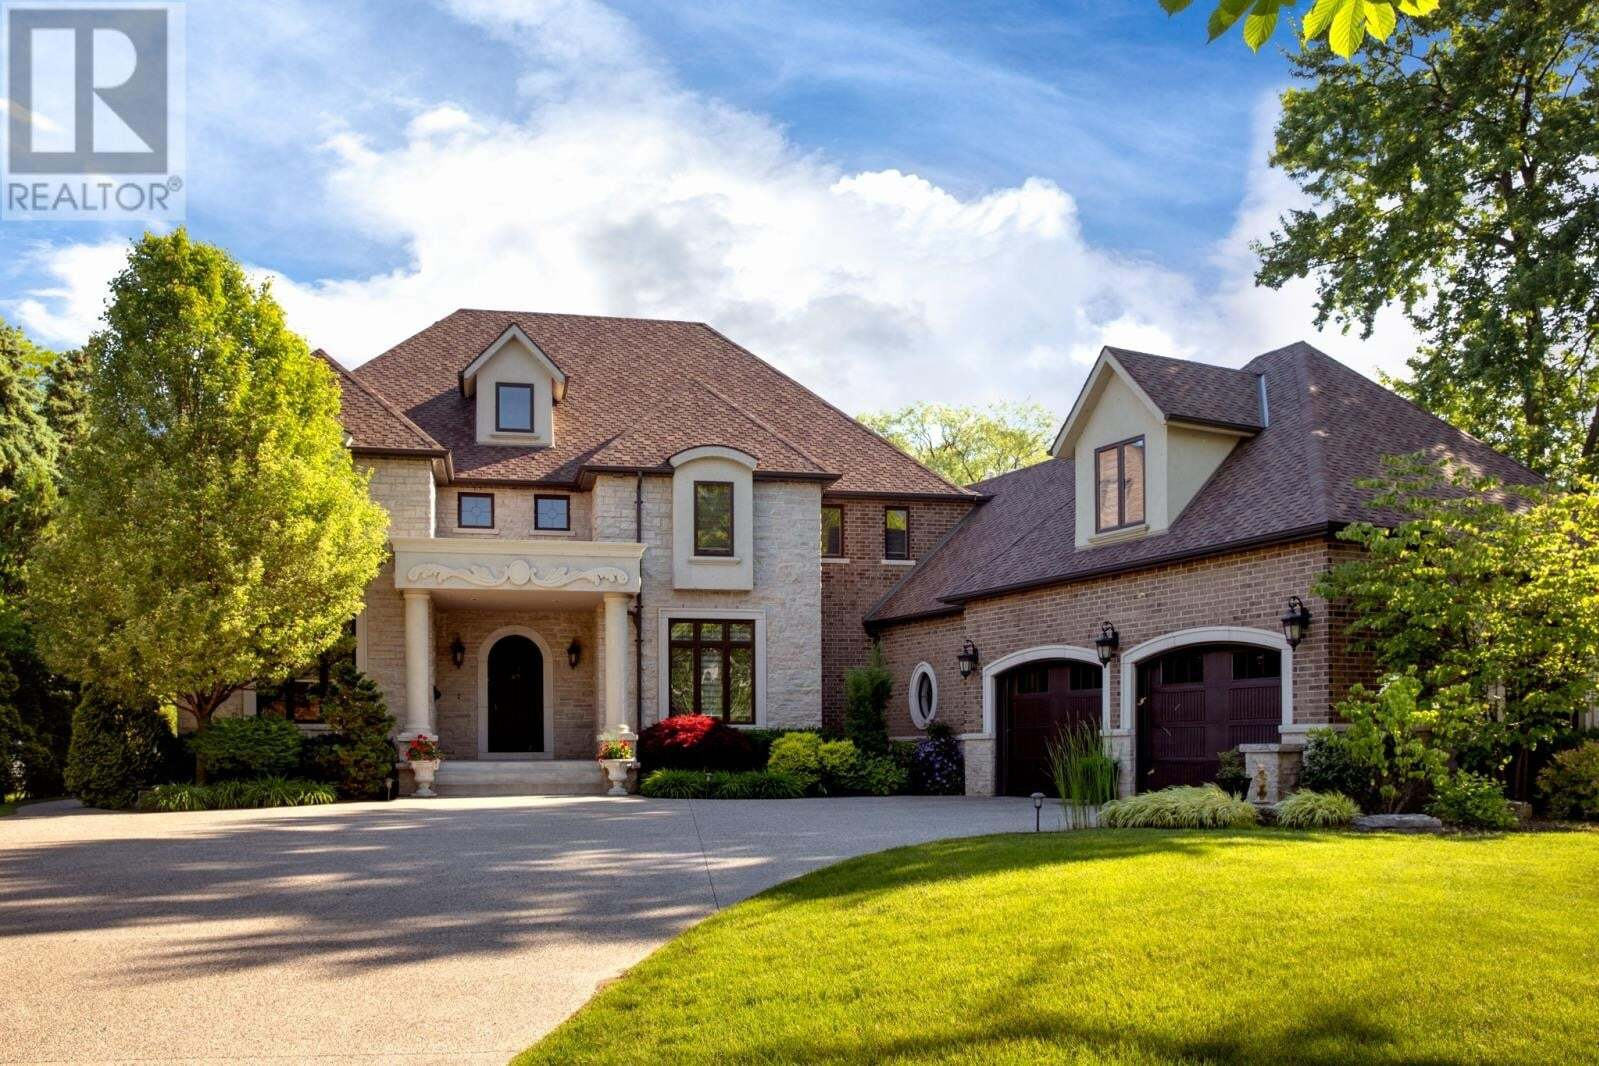 House for sale at 14260 Riverside Dr East Tecumseh Ontario - MLS: 20007458